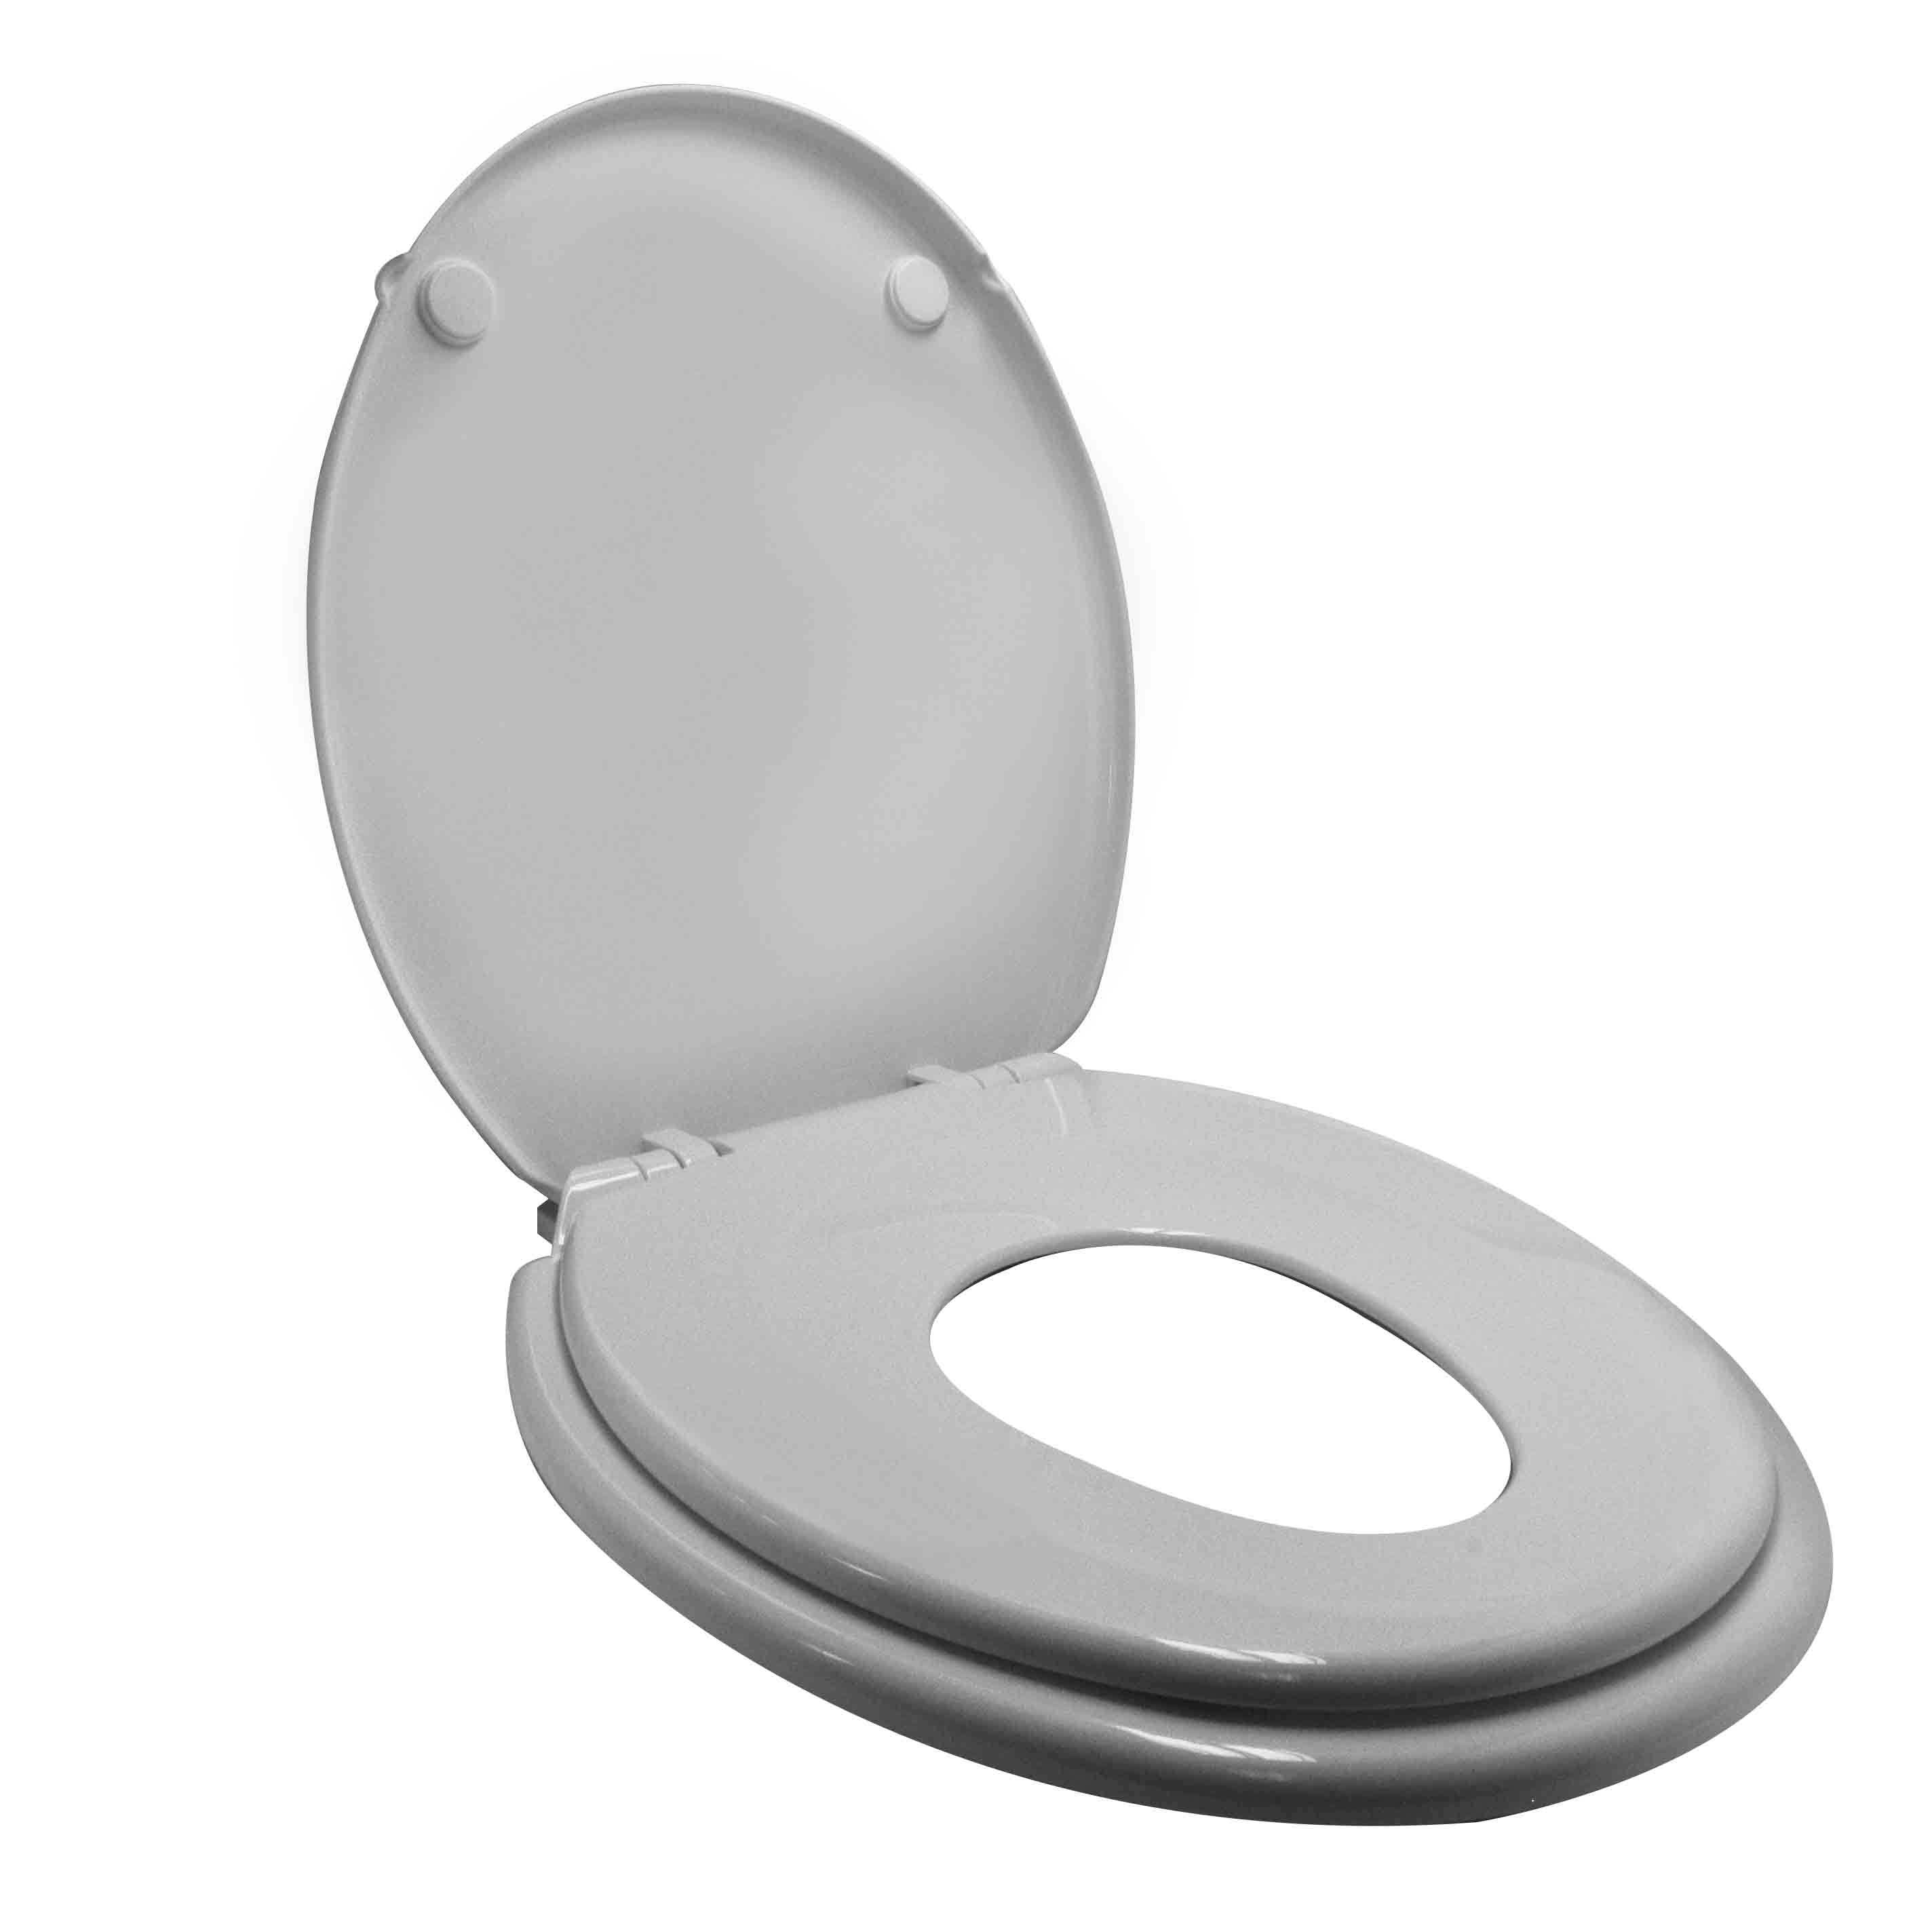 MuellerFamily 2.0 dubbele toiletzitting met soft-close